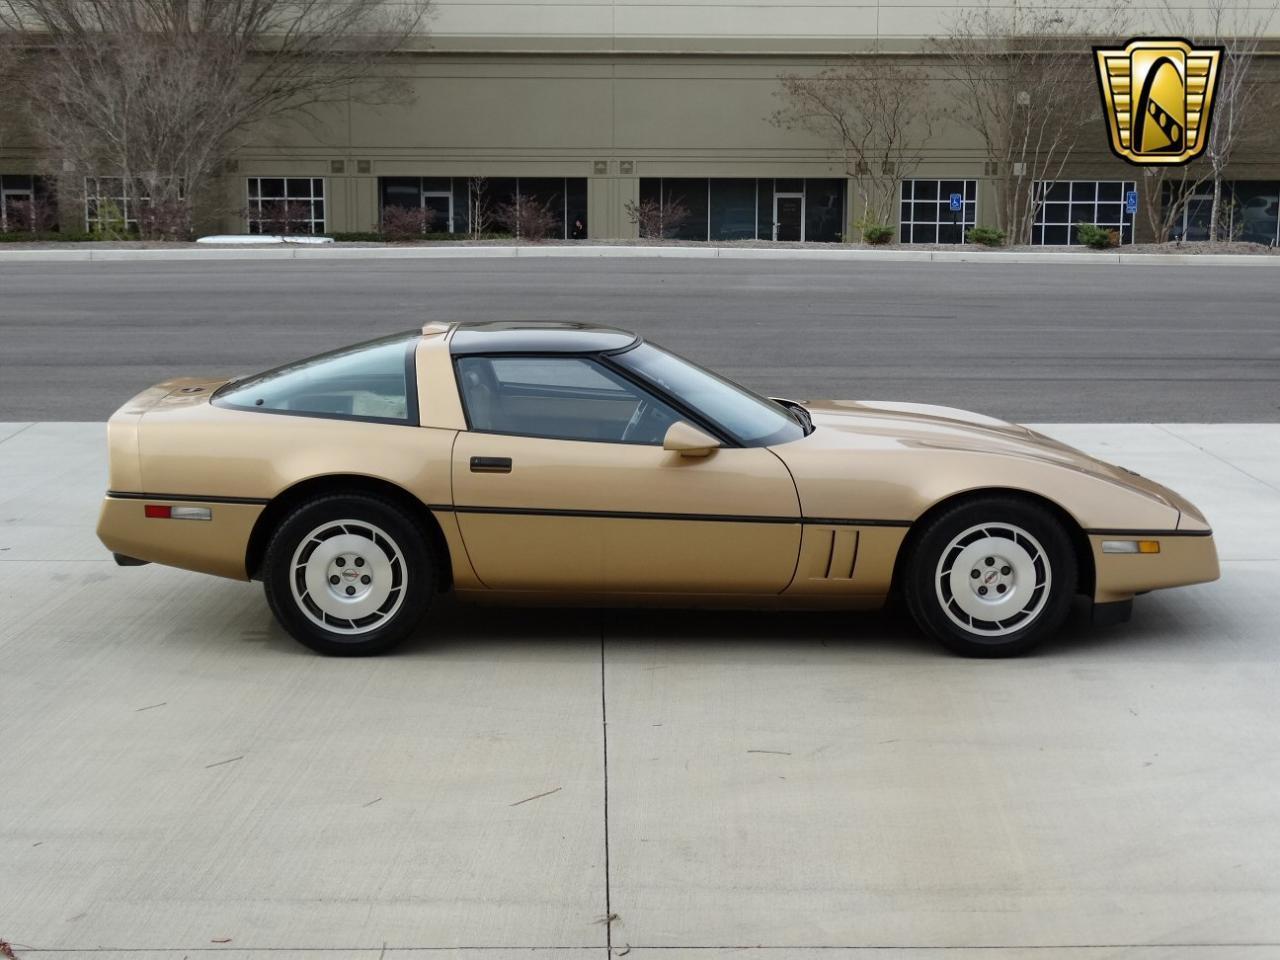 Large Picture of 1986 Corvette located in Alpharetta Georgia - $11,595.00 Offered by Gateway Classic Cars - Atlanta - KF5W